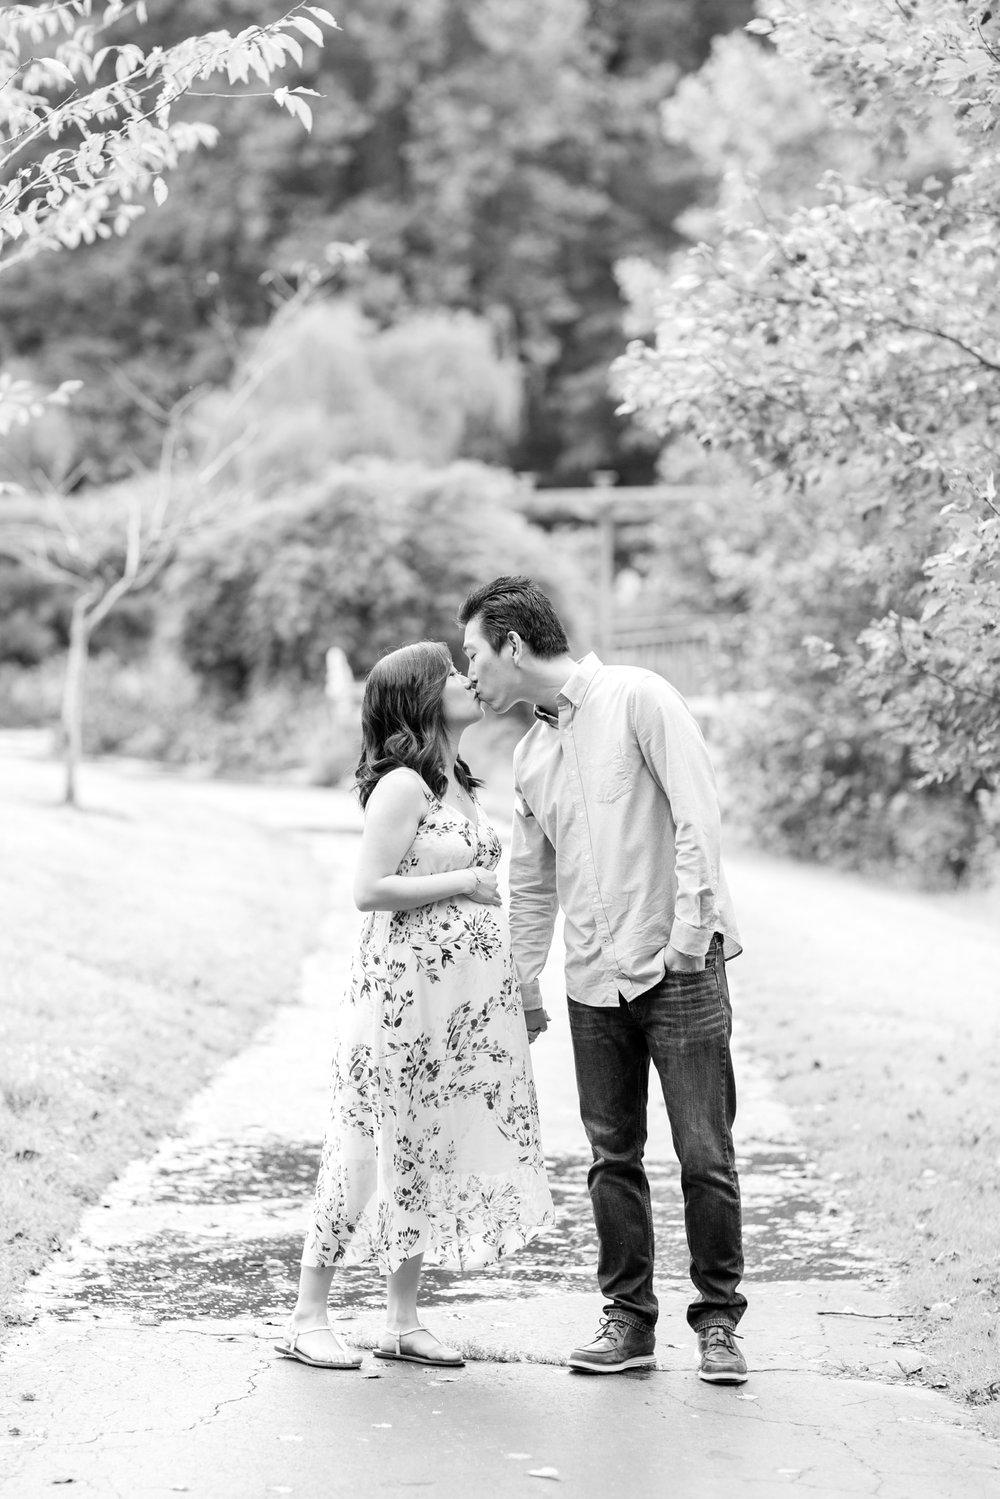 Elyse & Bryan Maternity-18_Meadowlark-Botanical-Gardens-maternity-Virginia-Maryland-maternity-photographer-anna-grace-photography-photo.jpg